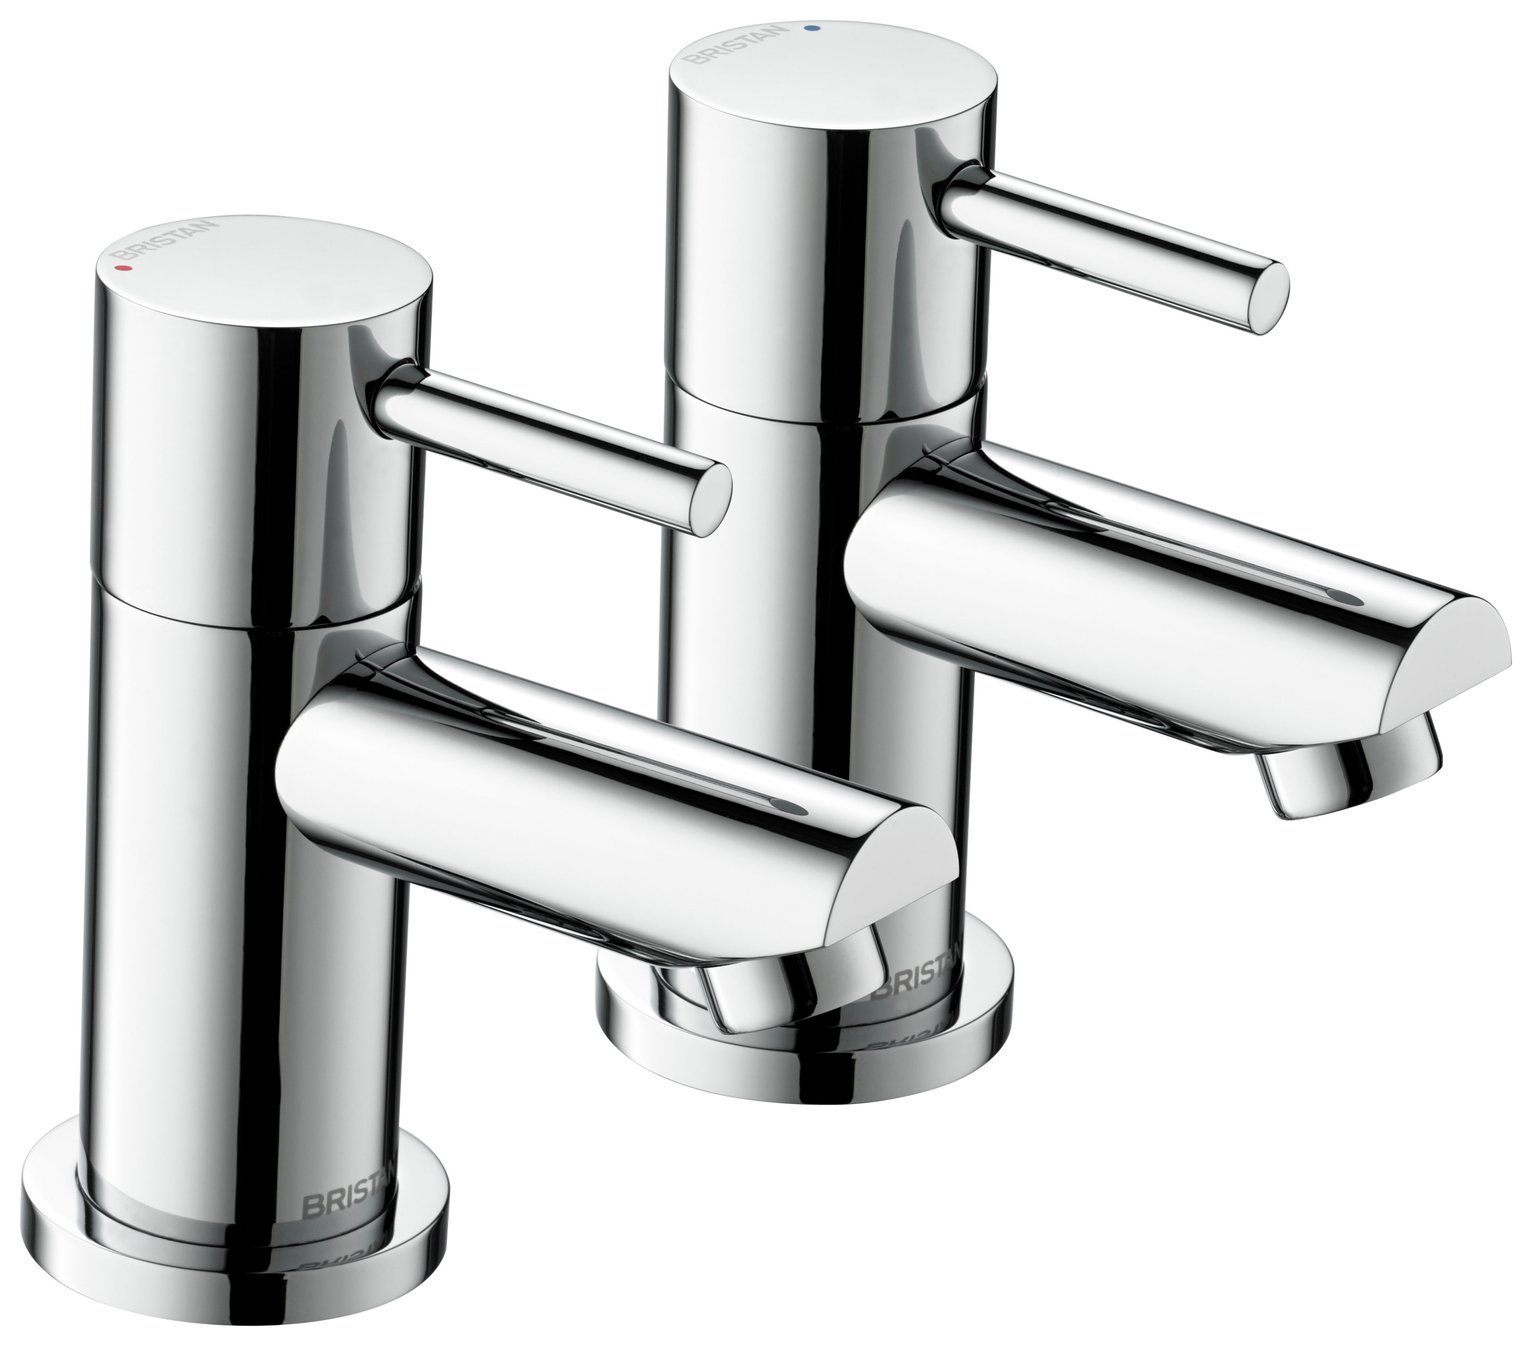 Bristan Blitz Bath Taps – Chrome865/6119